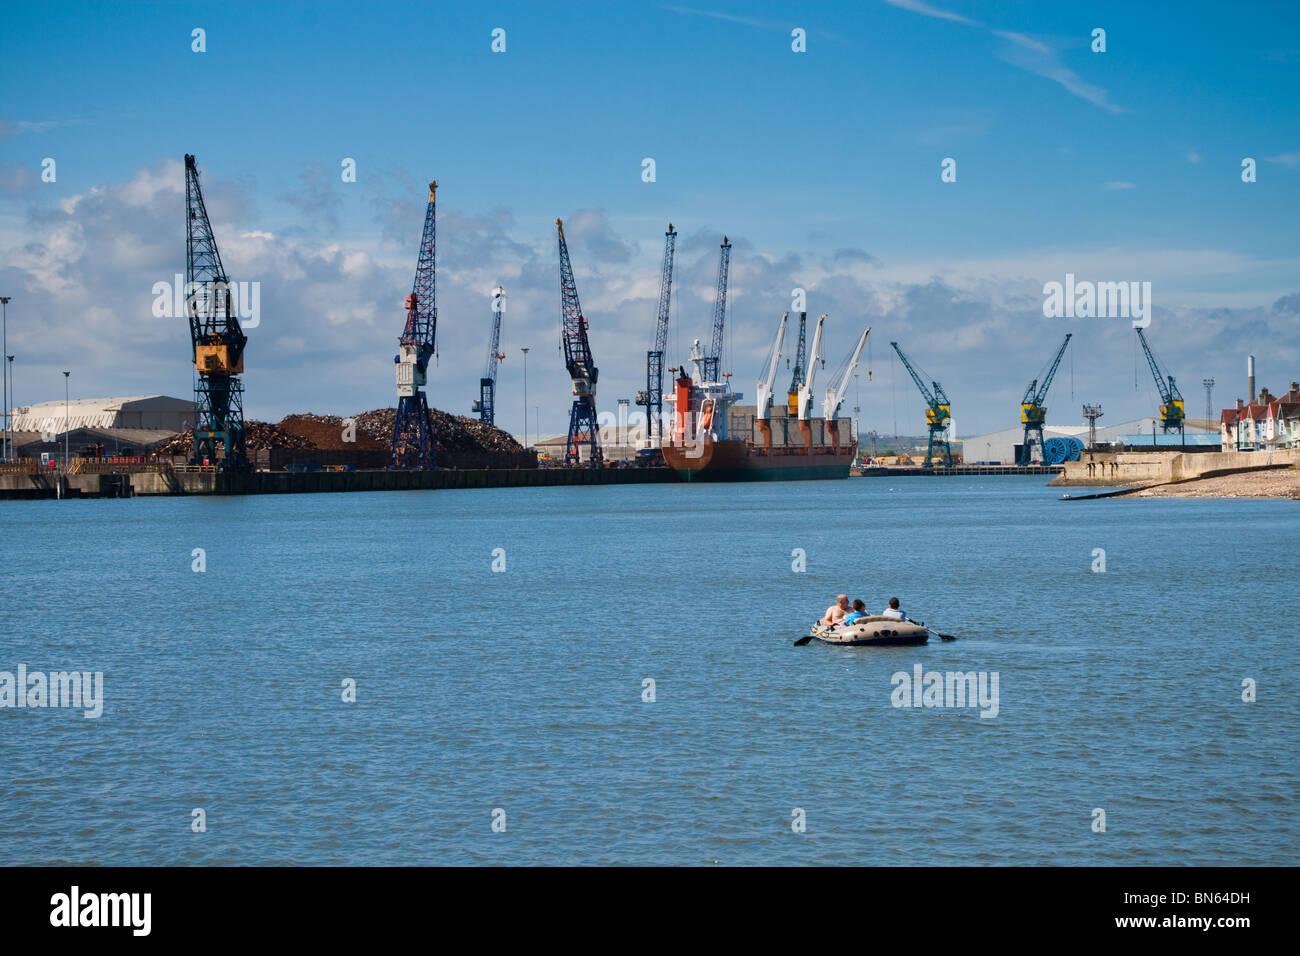 Shipping Docks and Pleasure Dingy, The Headland, Hartlepool, England - Stock Image